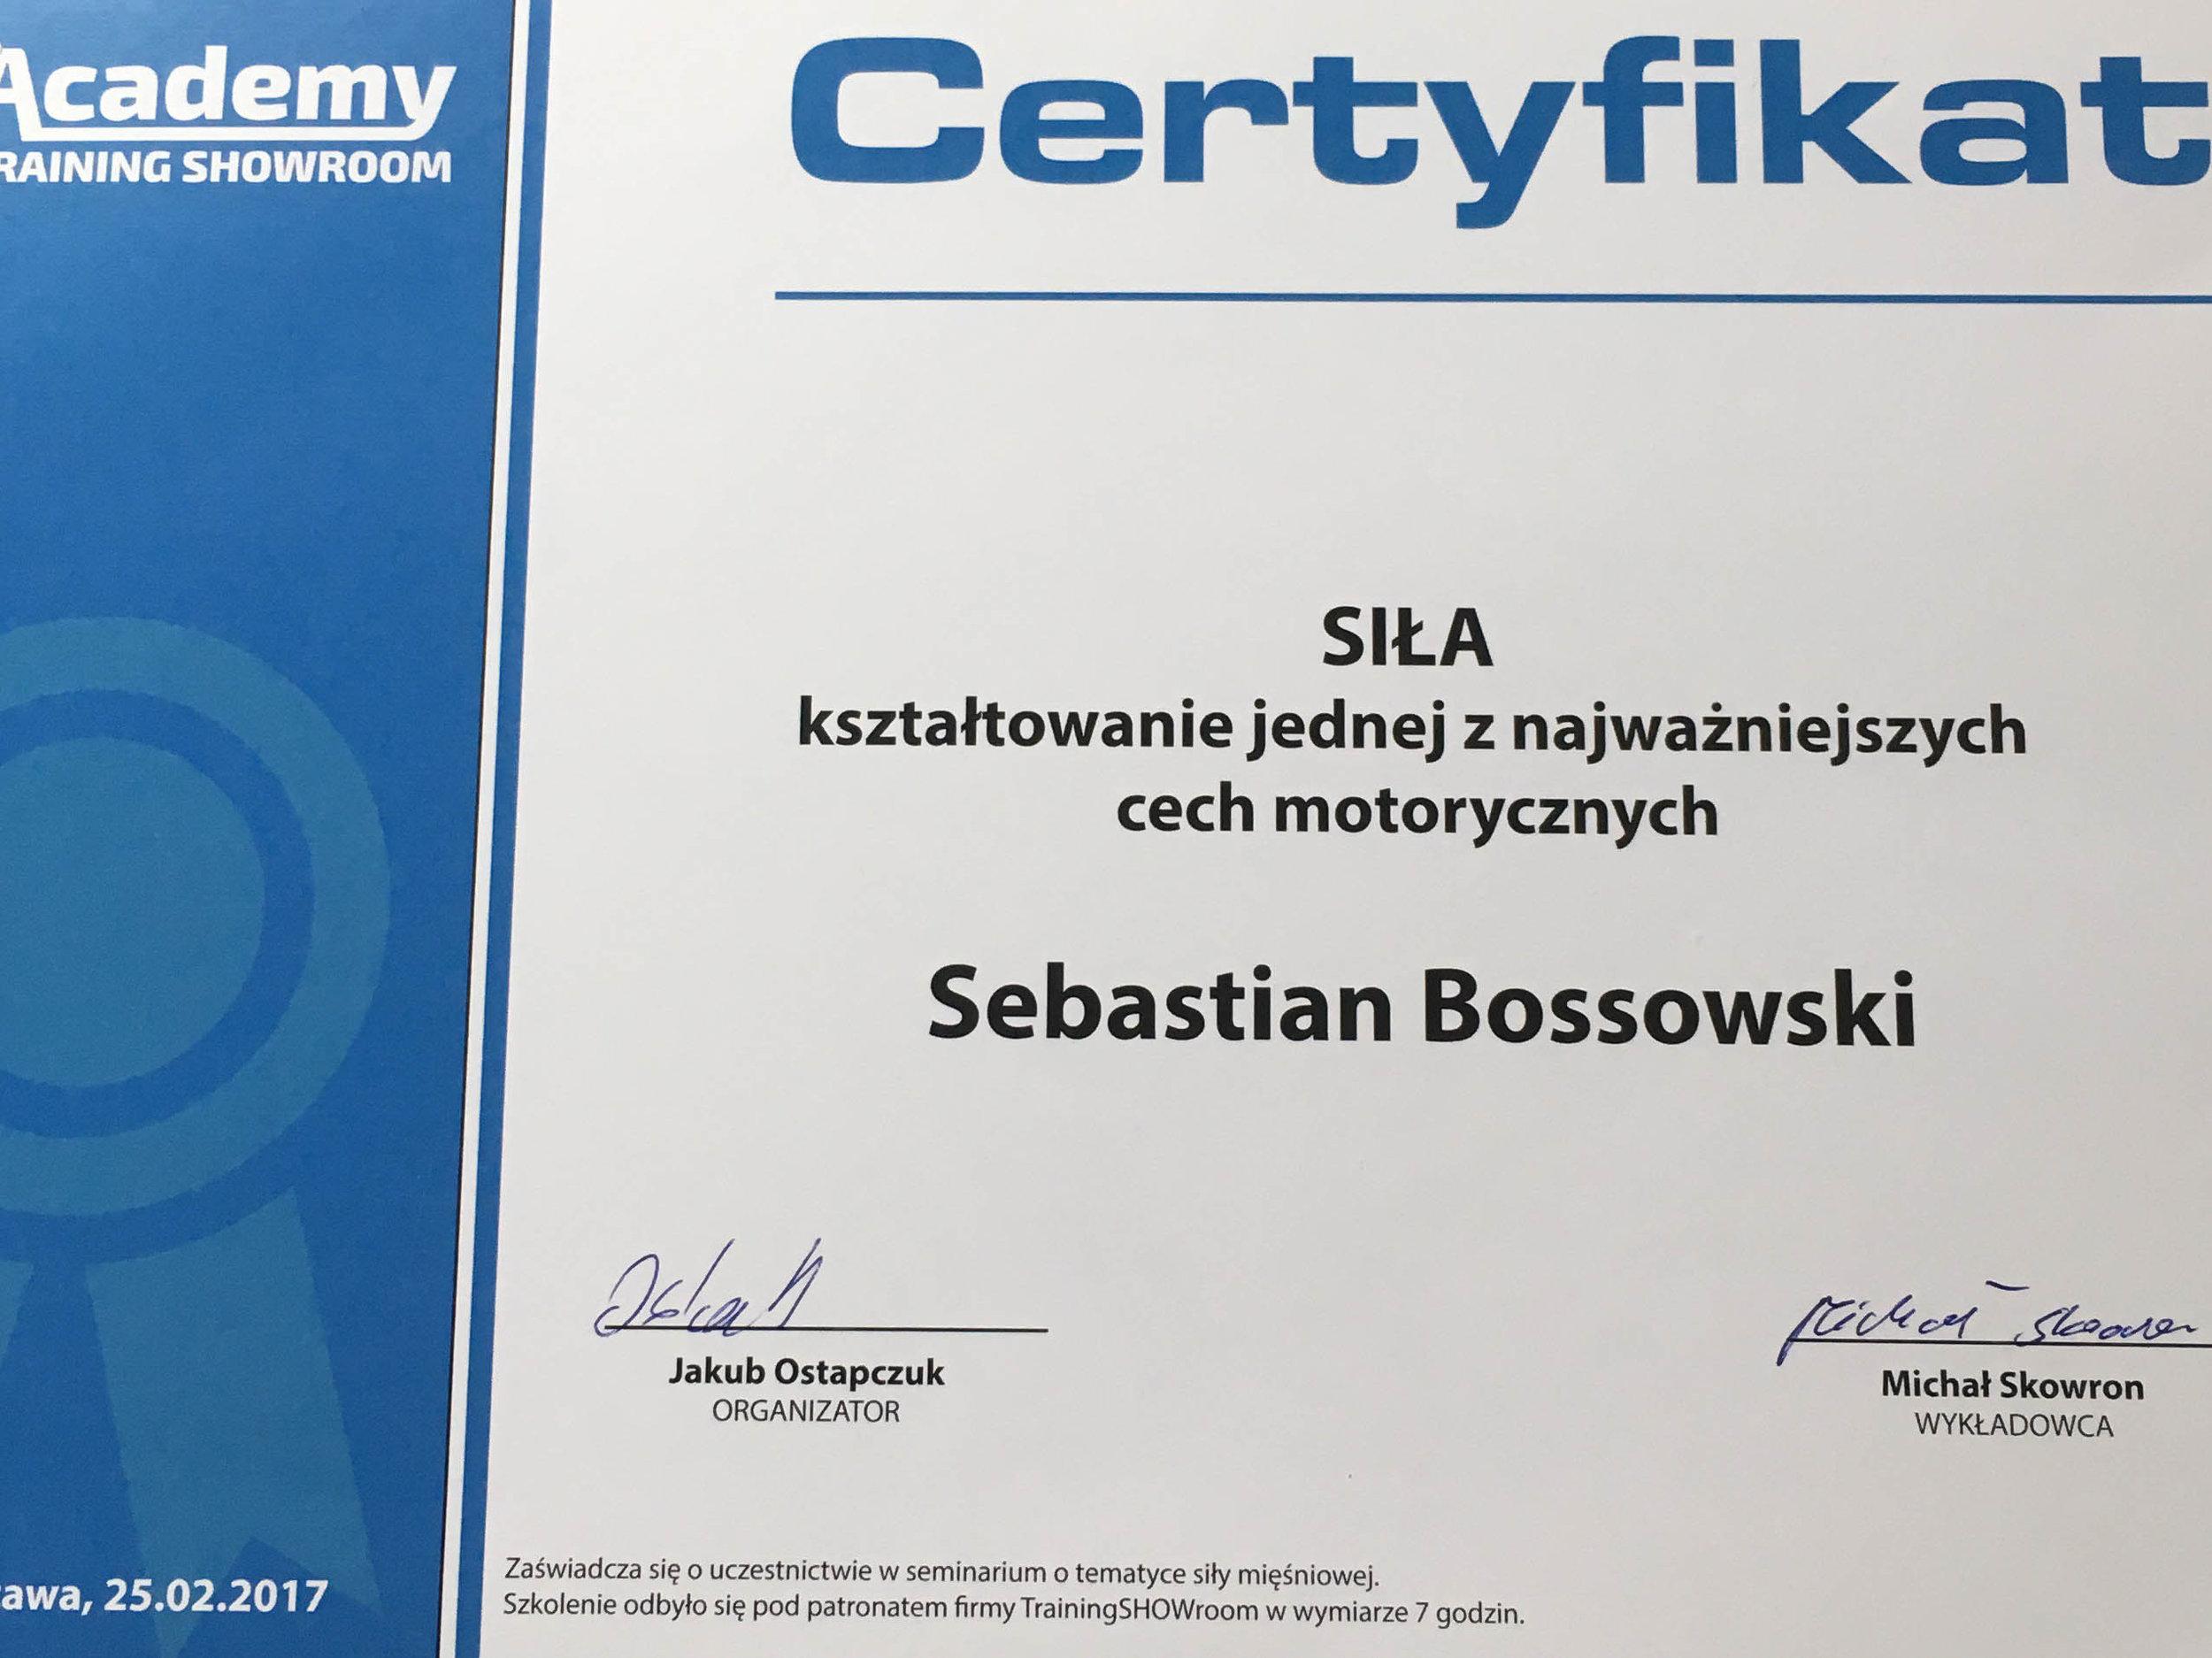 Sebastian Bossowski certyfikat 5.jpg